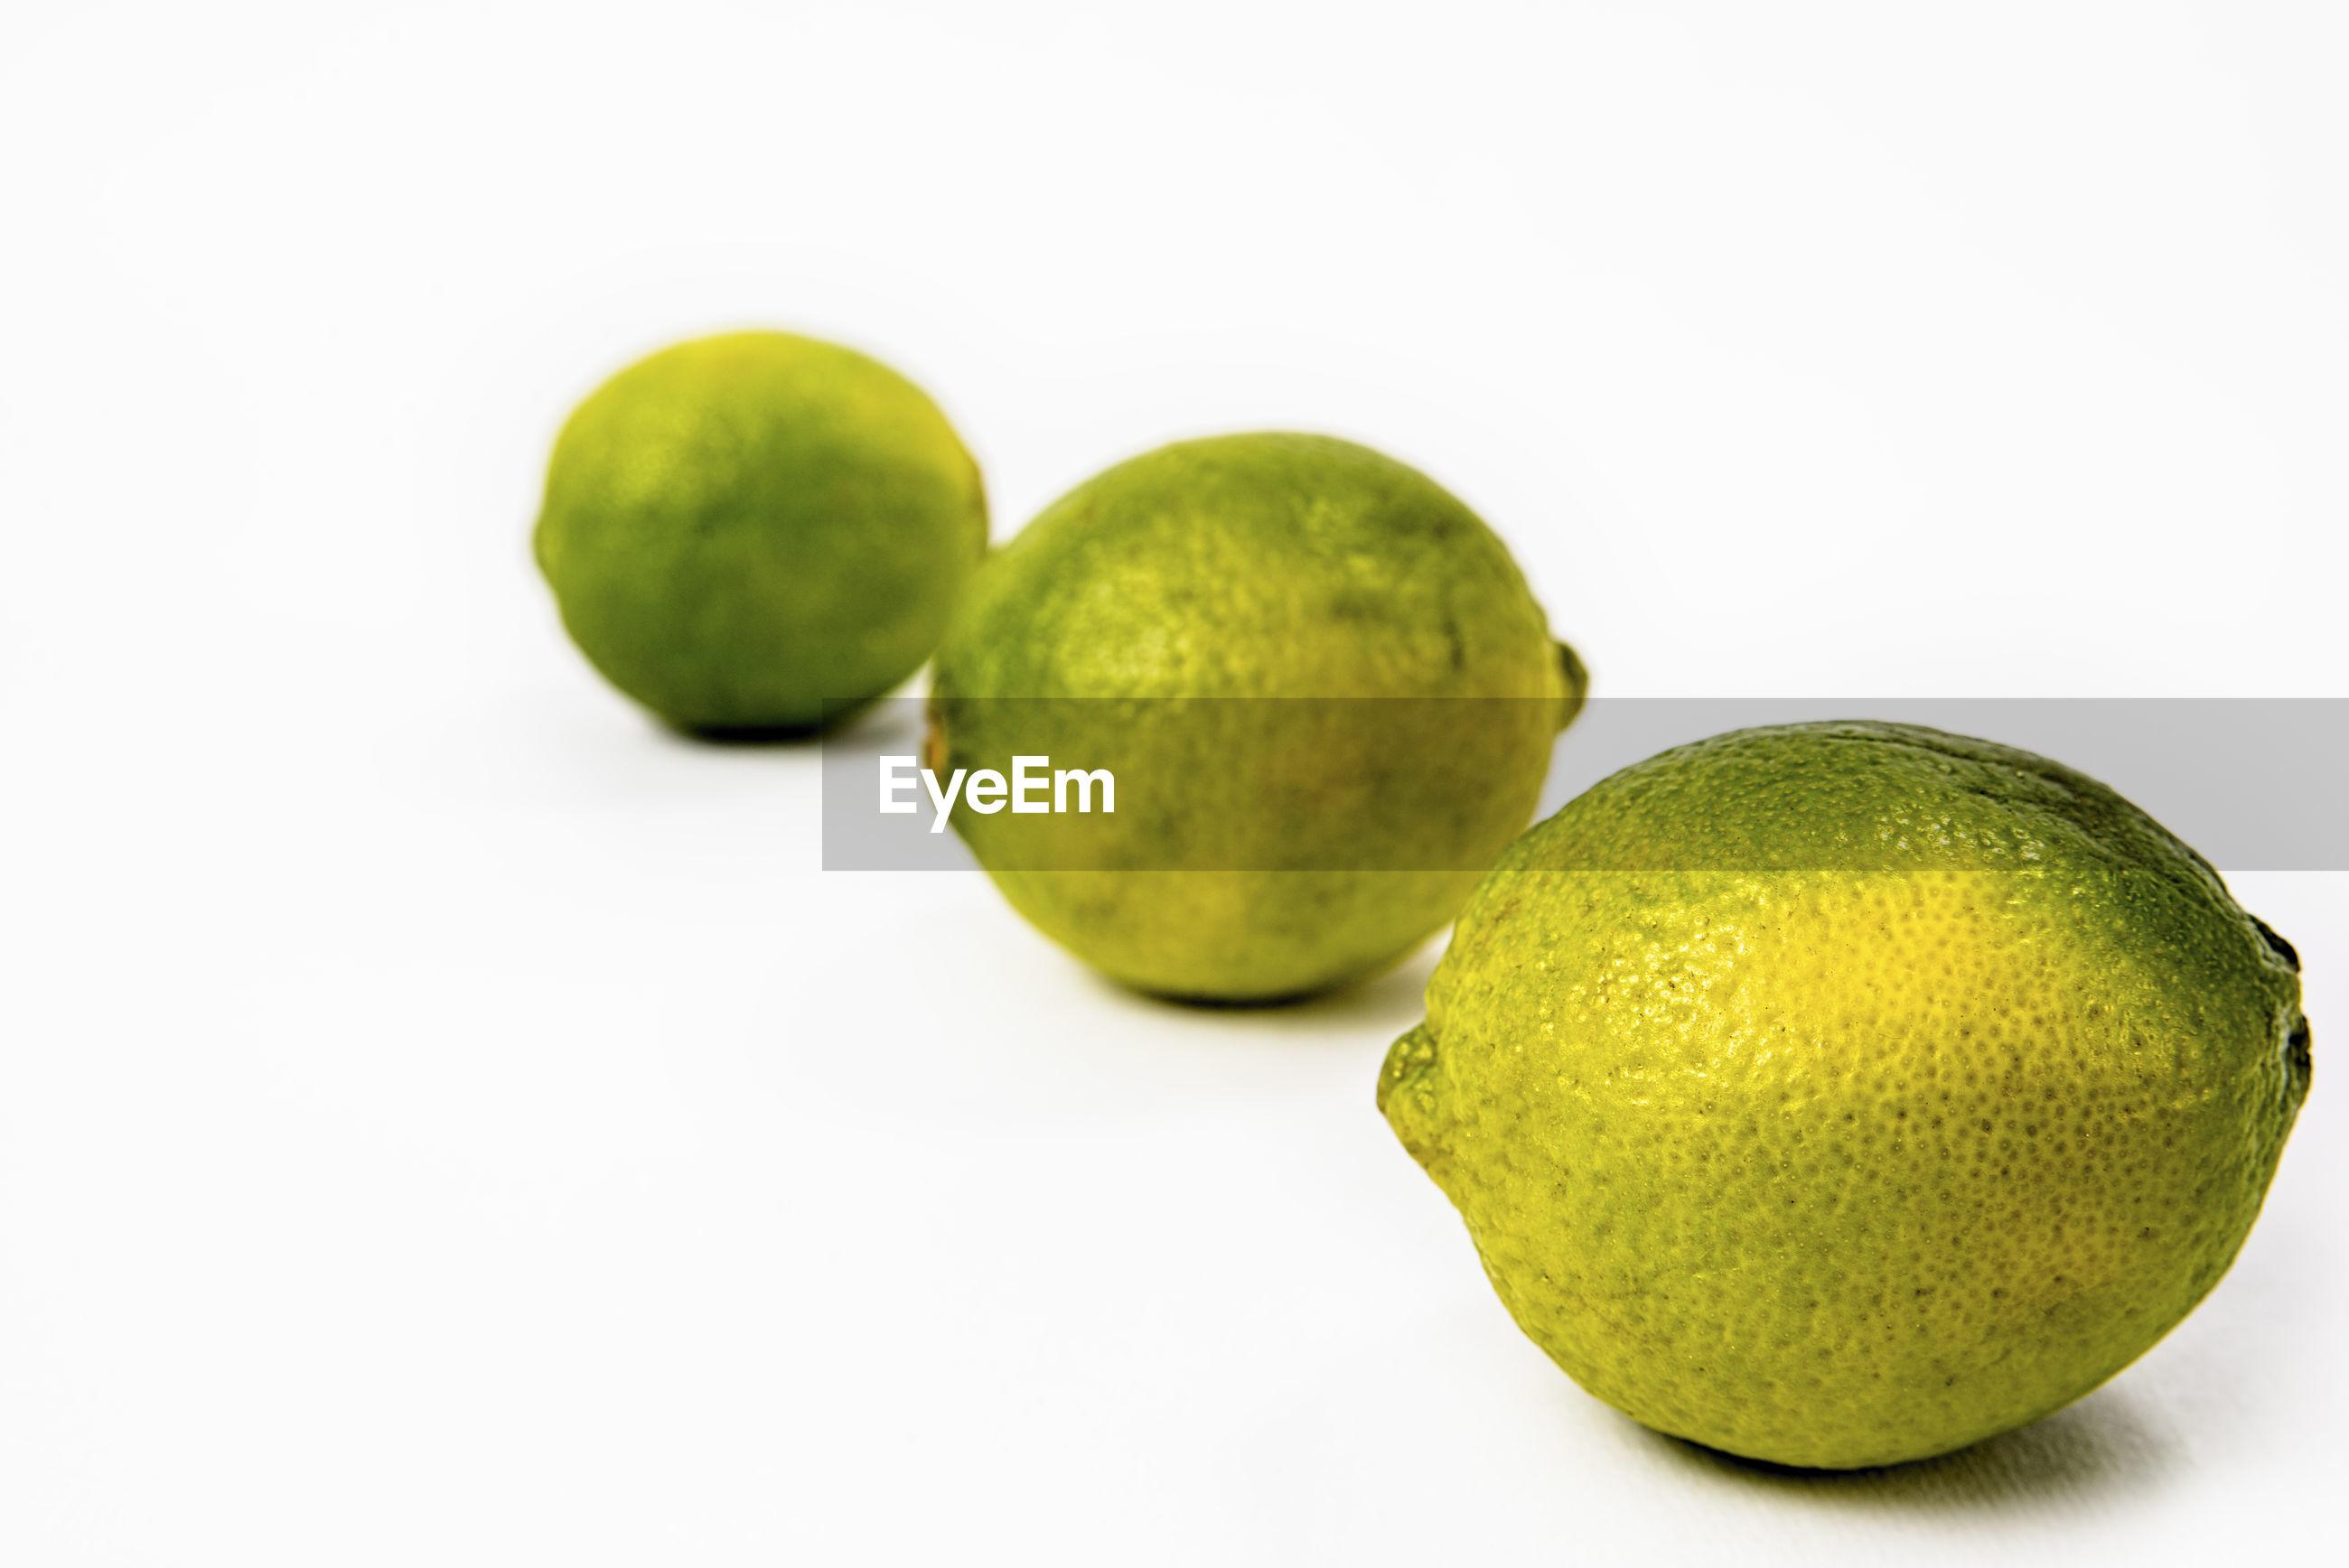 CLOSE-UP OF GREEN FRUITS